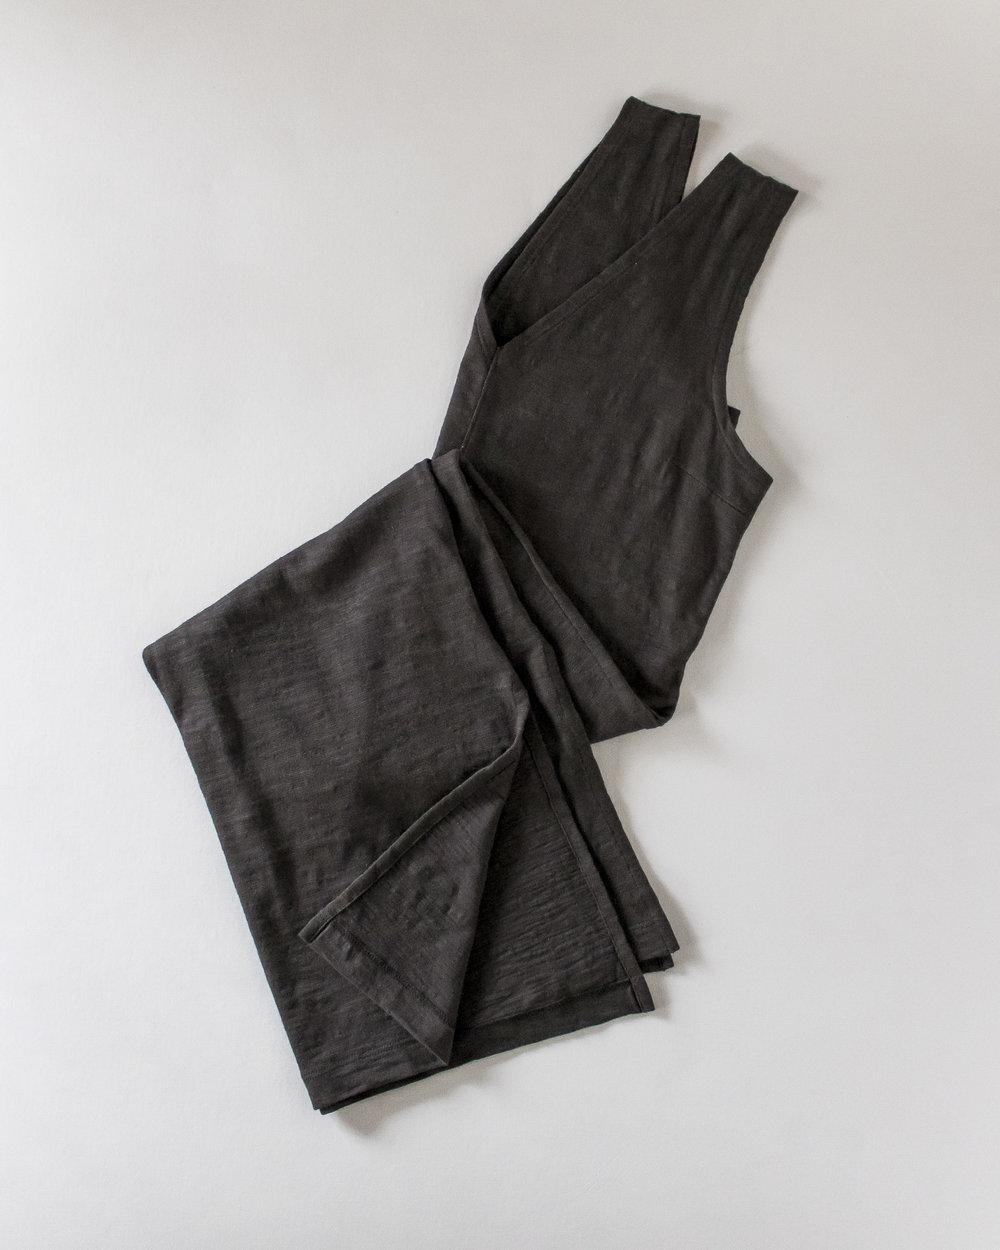 candela_utility_dress_4.JPG